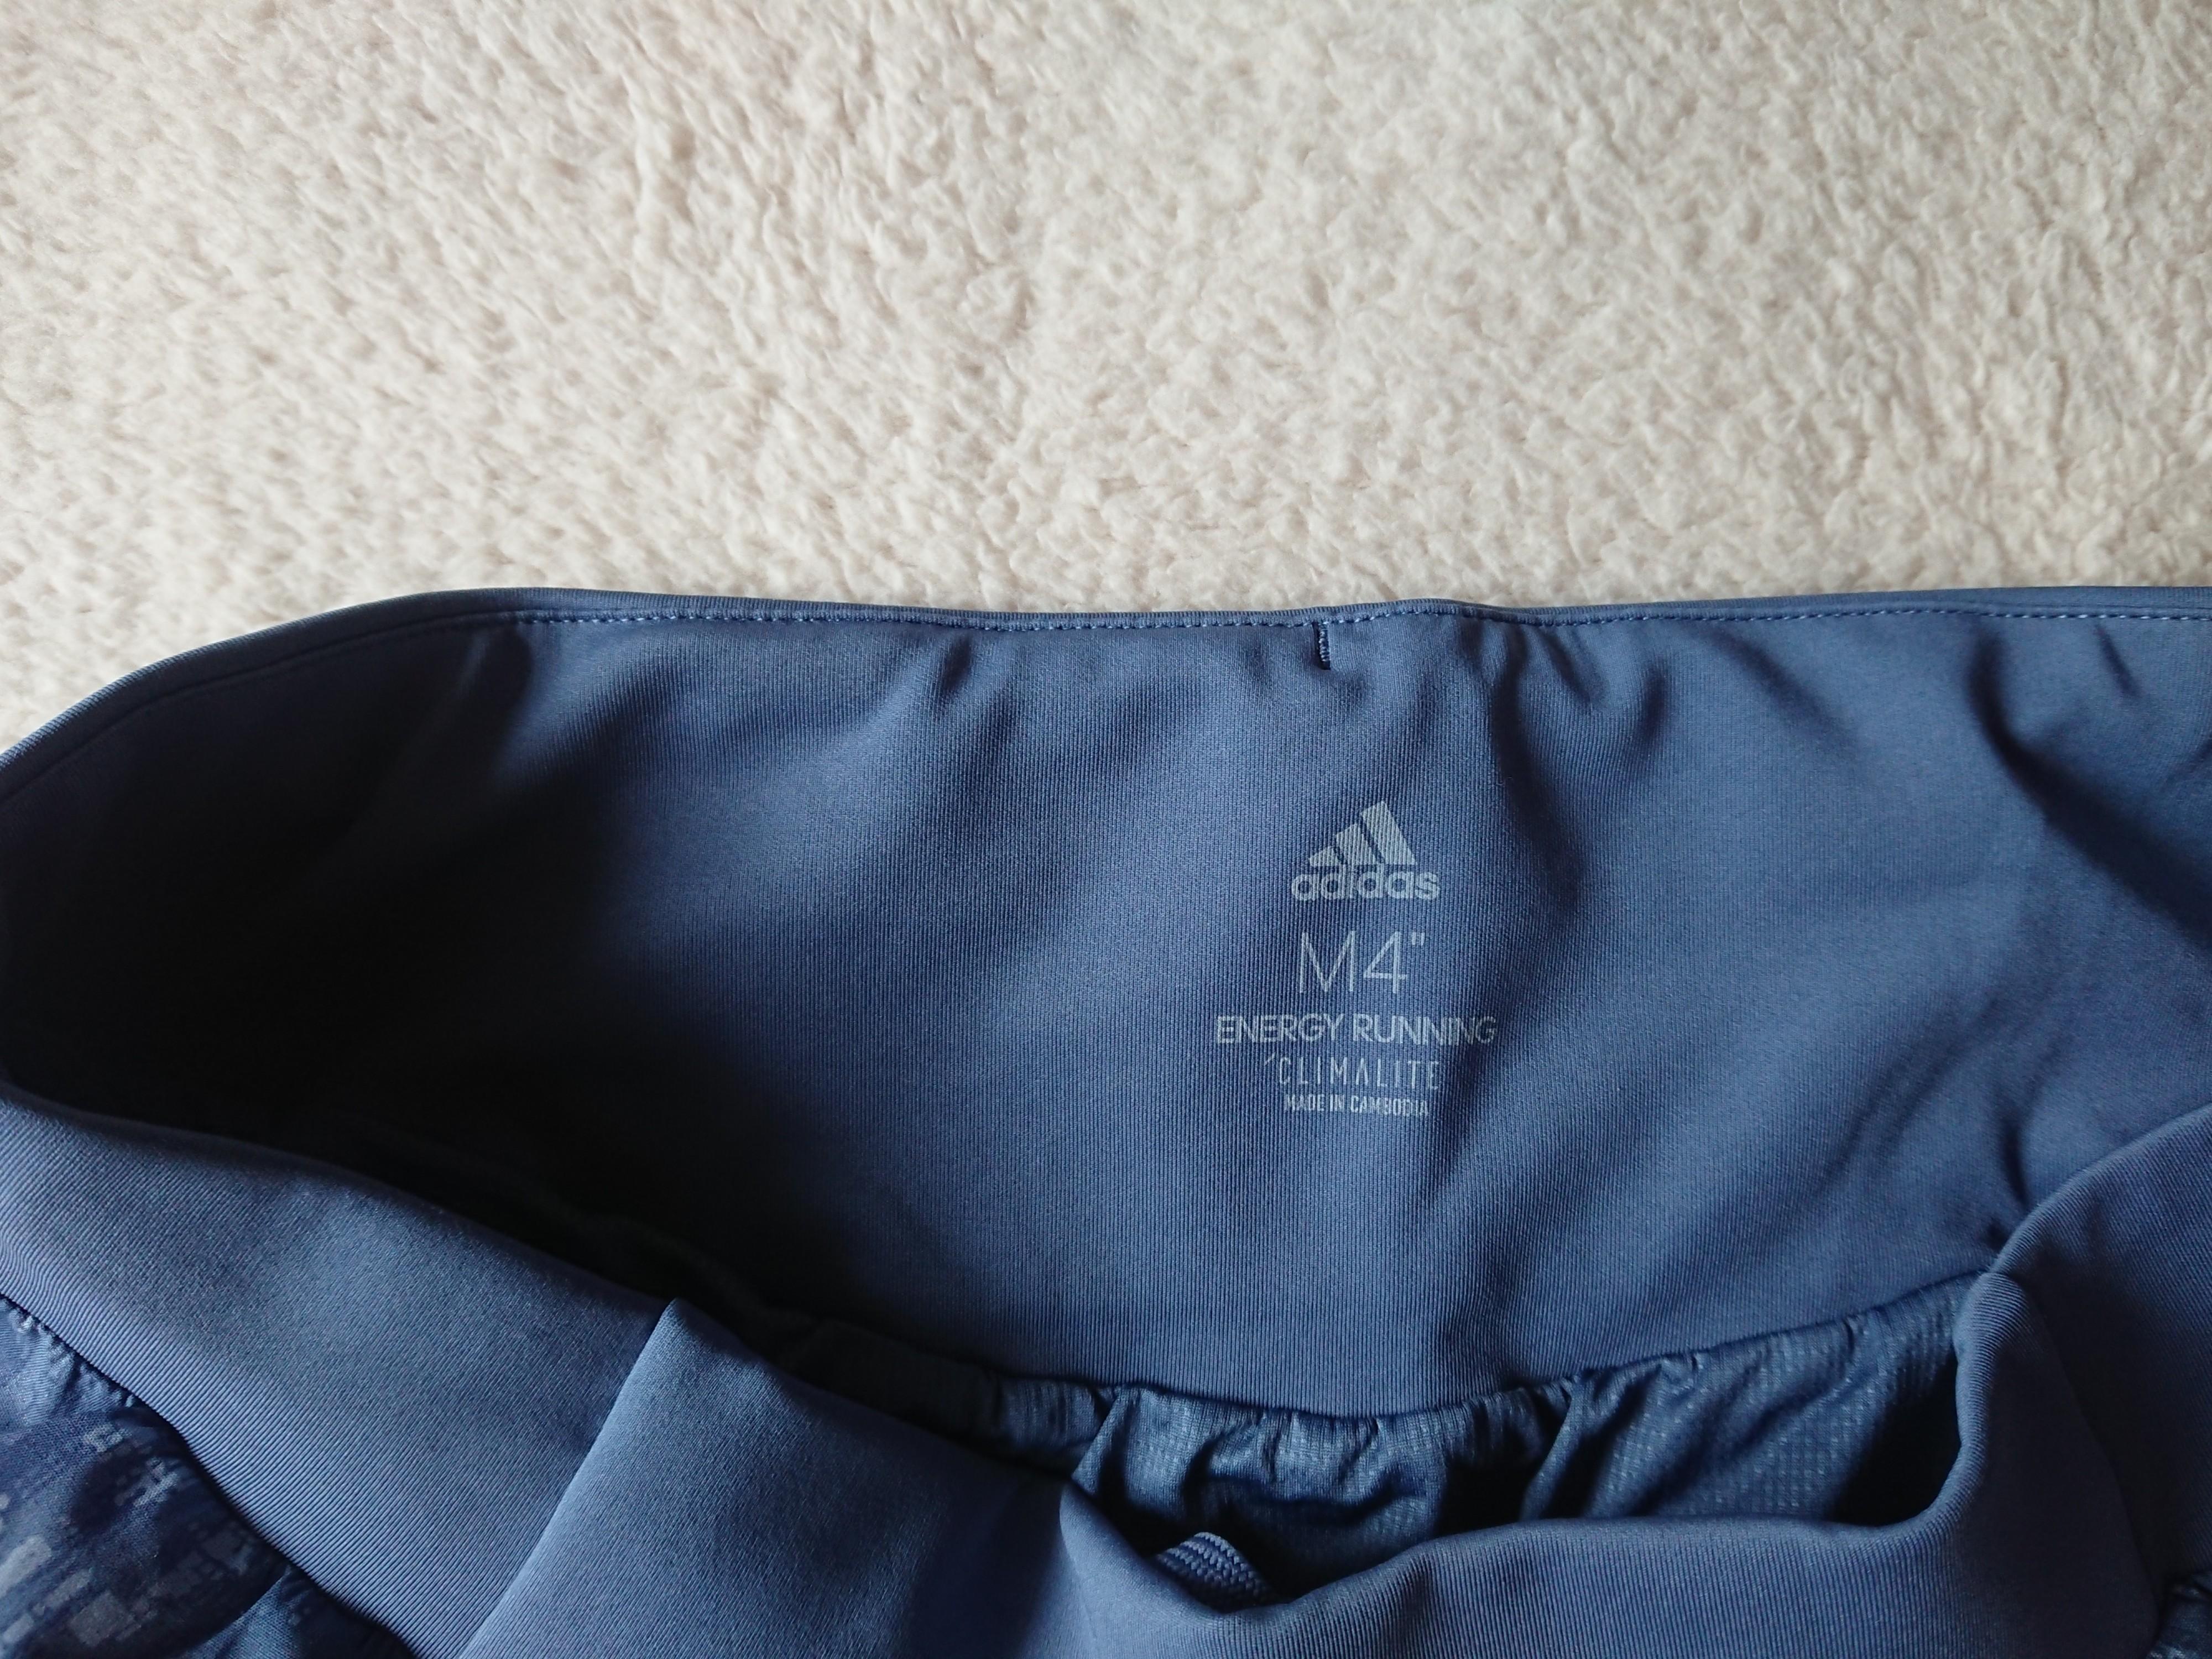 Adidas Women's 運動褲 / 跑褲